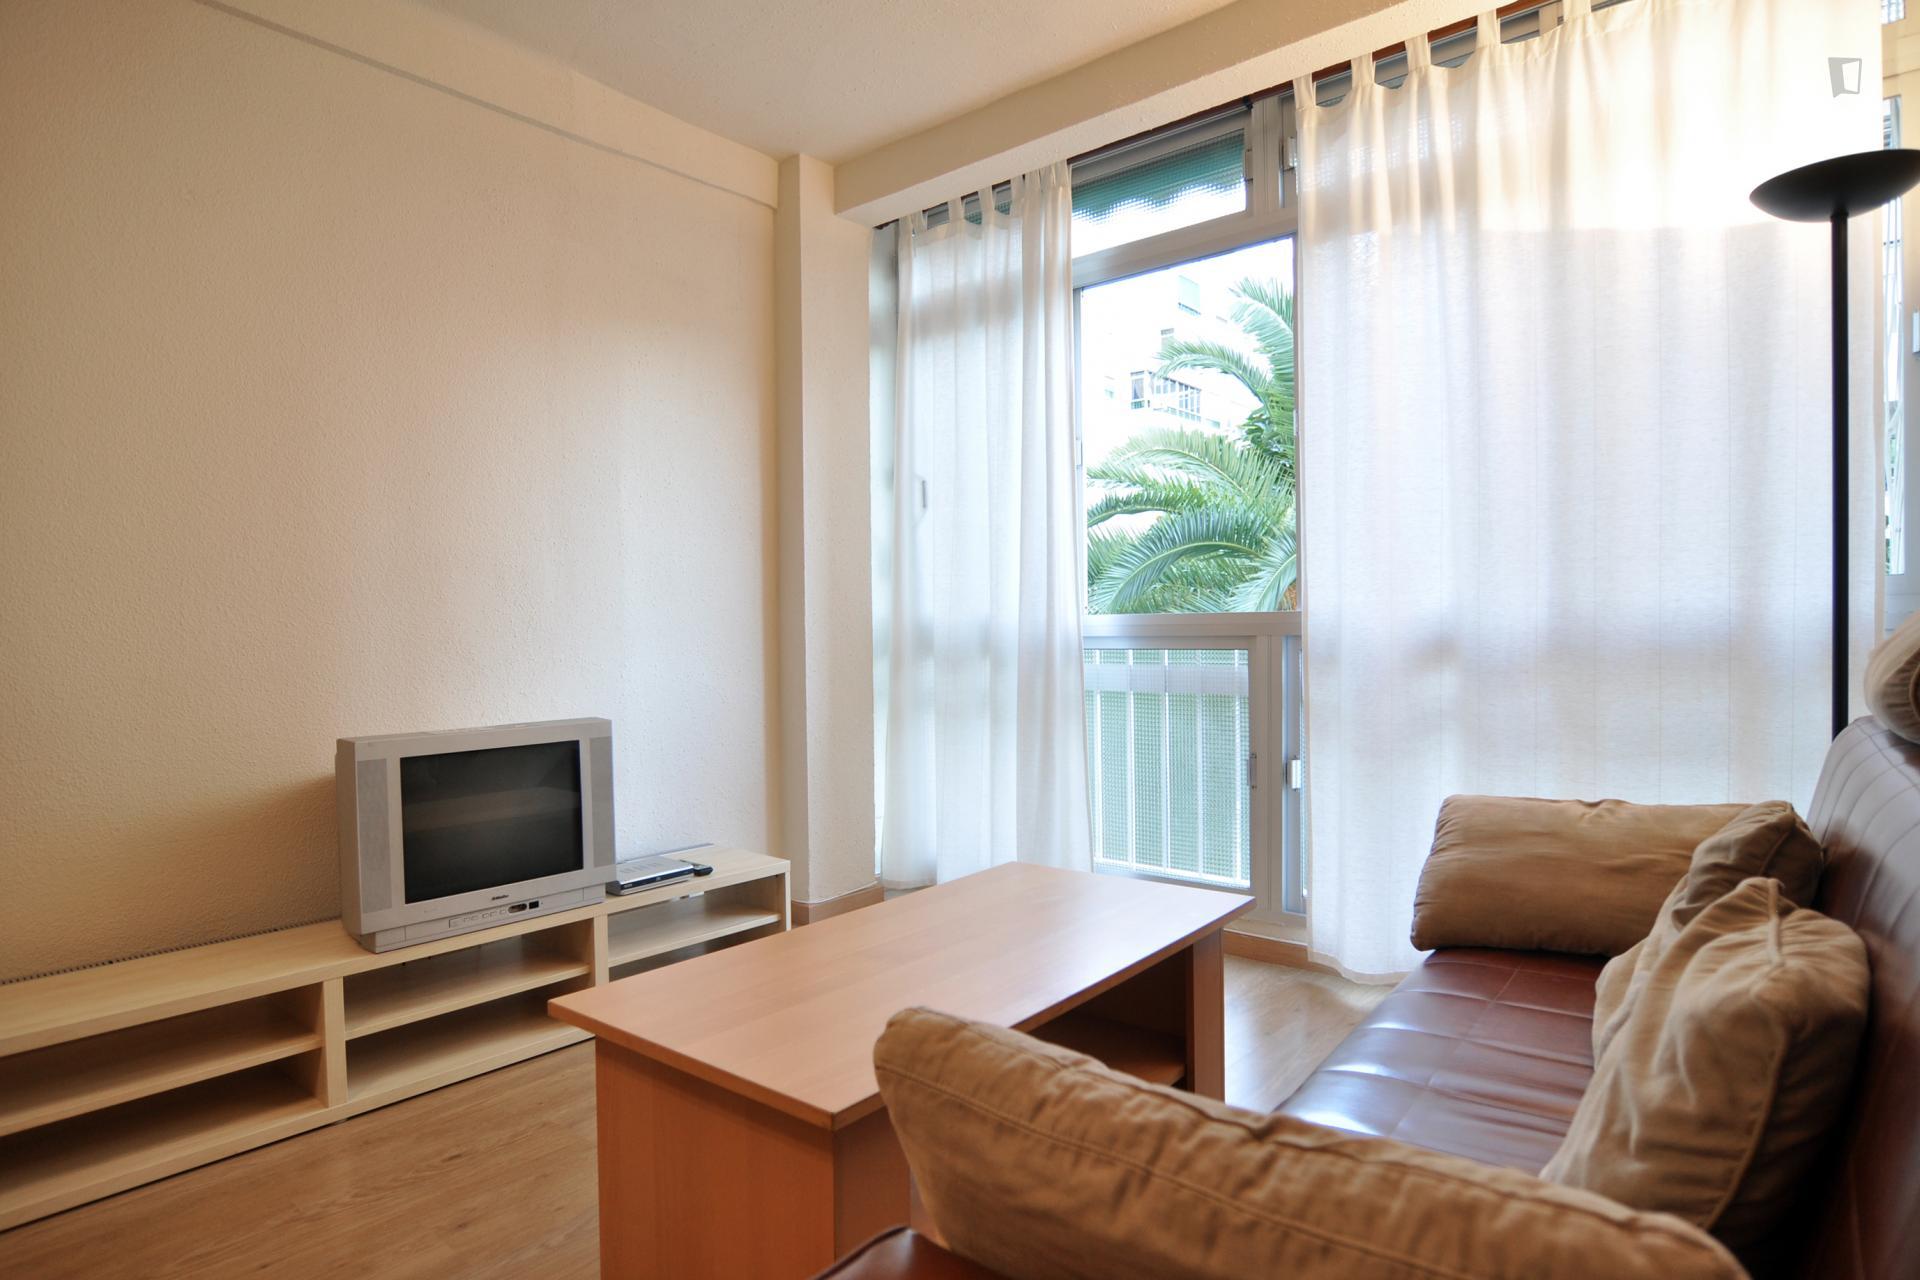 Gross- Gross- Gross- Comfortable 3 Bedroom flat in Malaga 3 Bedroom flat in MalagaComfortable 3 Bedroom flat in Malaga